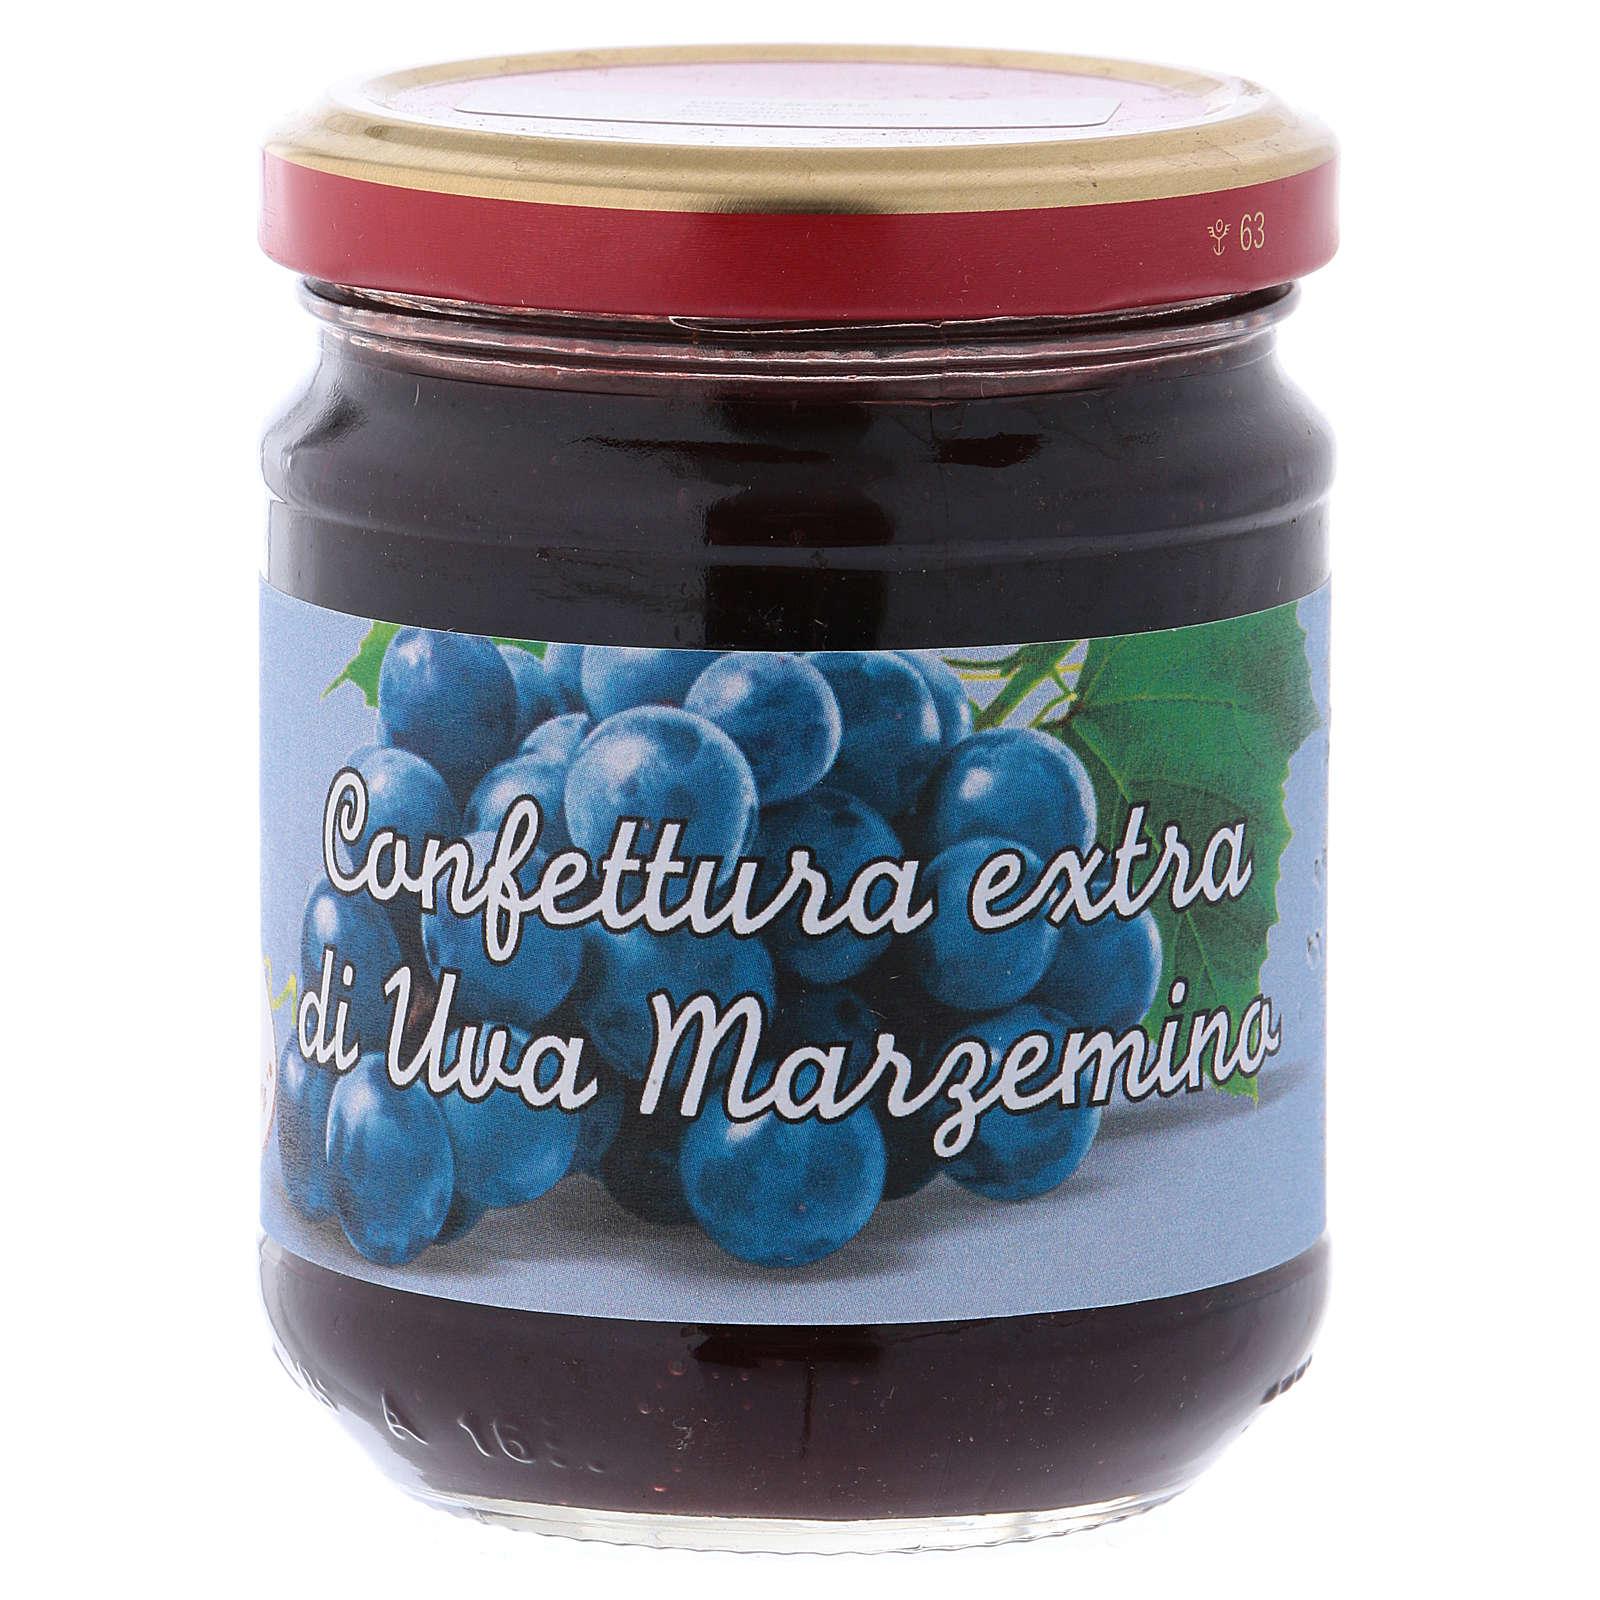 220gr extra Marzemino grape jam of St. Anthony of Padua 3